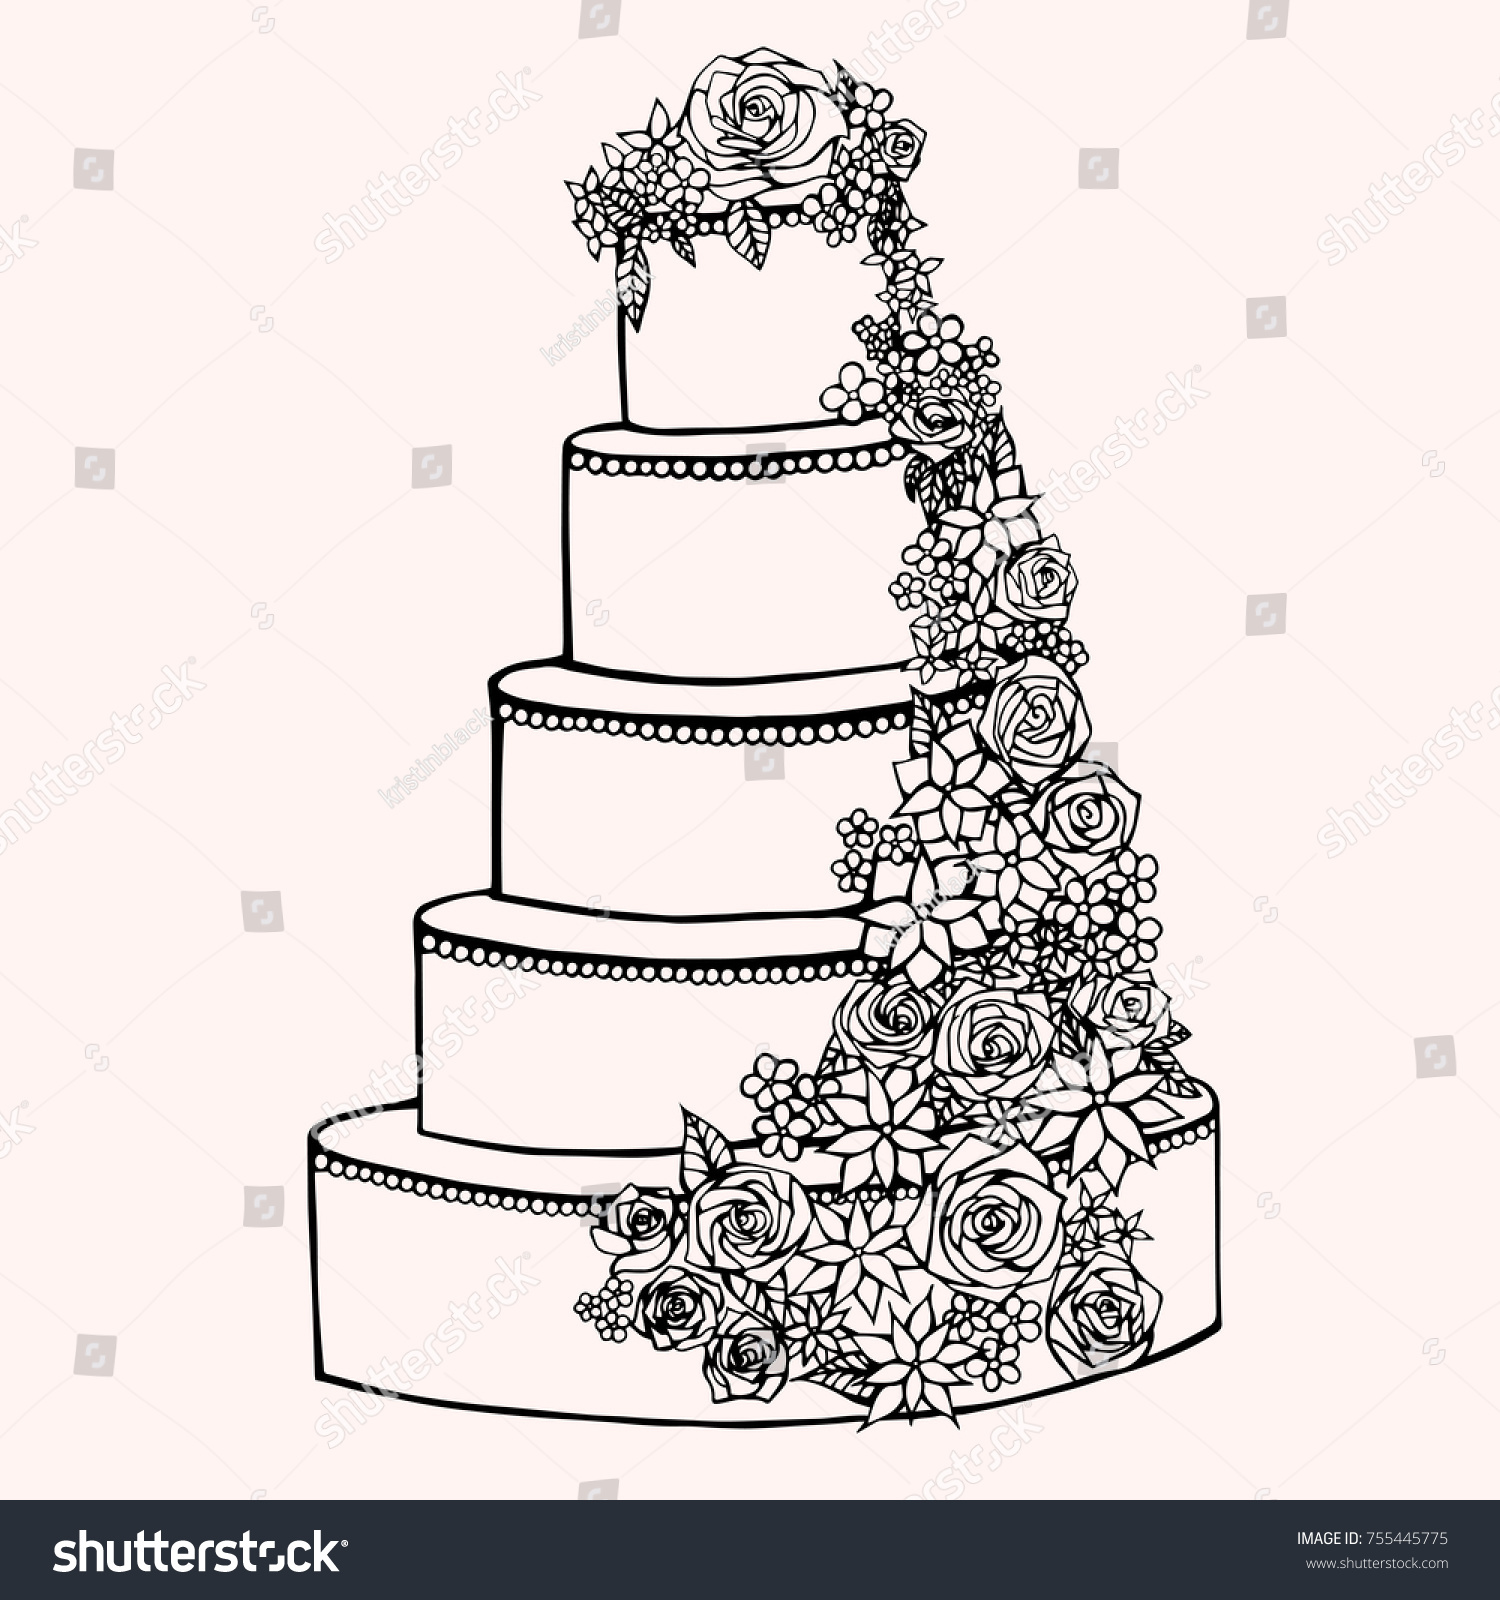 Cake Decorative Handdrawing Vector Illustration Sketch Stock Vector